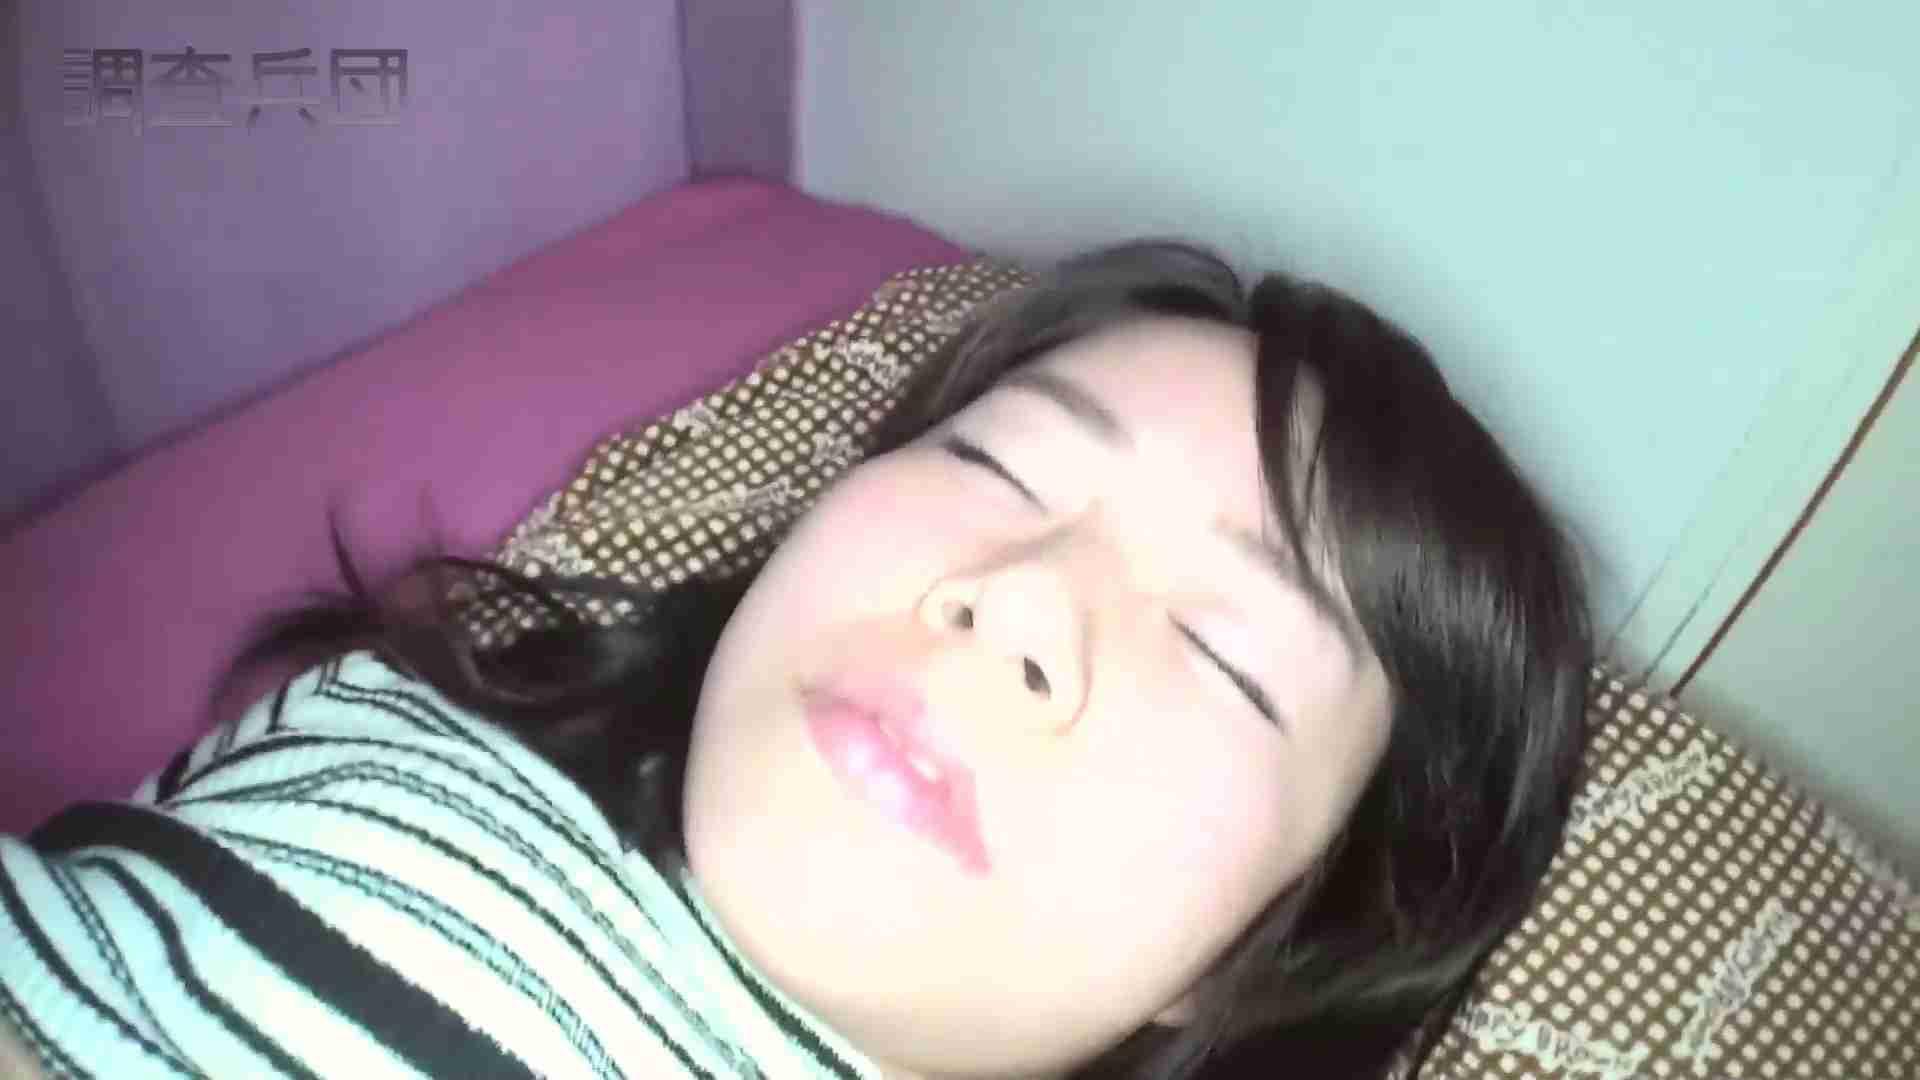 RE:~反撃の悪戯~vol.9 帰国子女の才女・みほ【前編】 巨乳 エロ画像 57画像 57